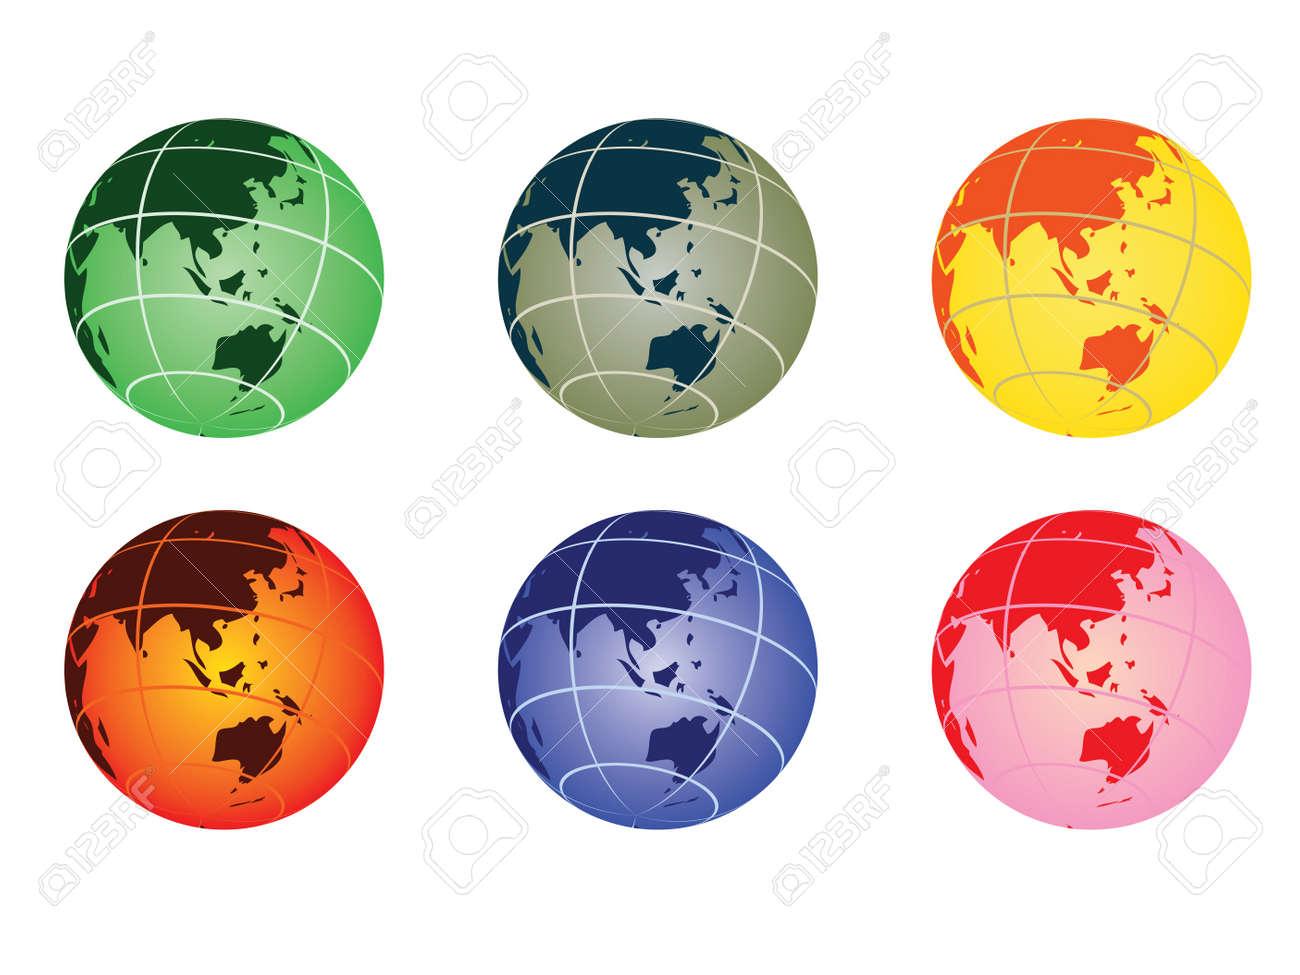 globe vector illustration - australia Stock Vector - 10875007